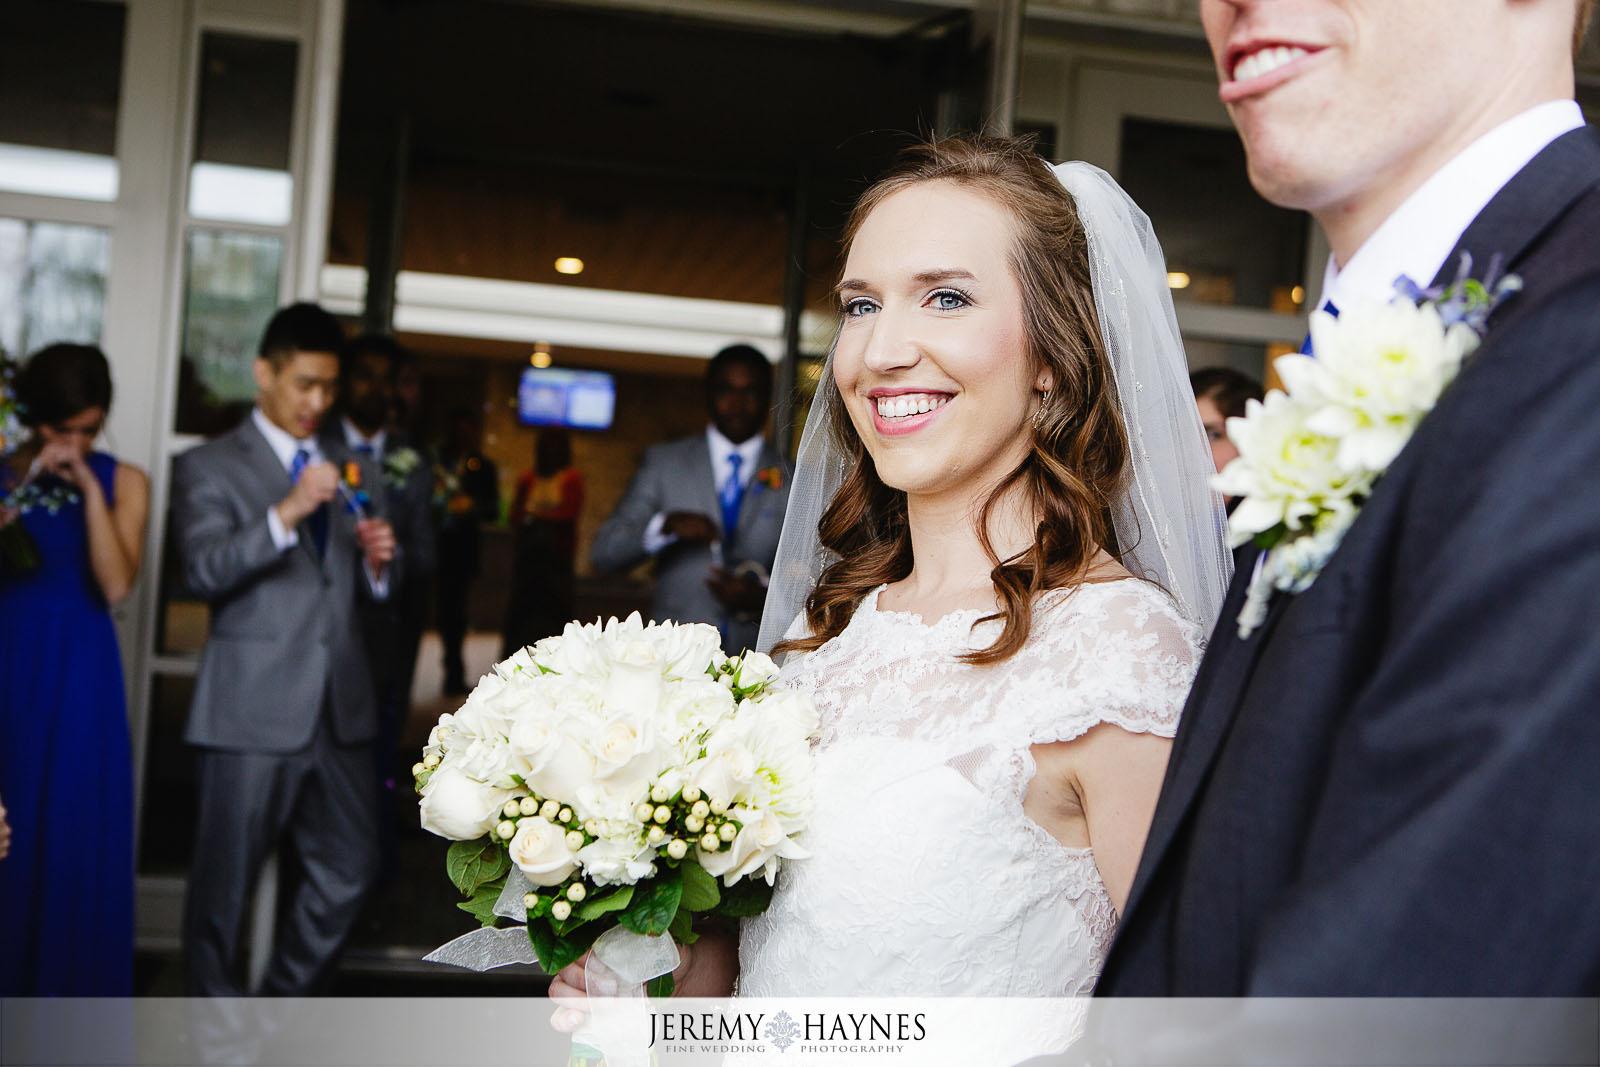 indianapolis-wedding-st-elizabeth-ann-seton-catholic-church-fun-ceremony-exits-jeremy-haynes-photographers.jpg